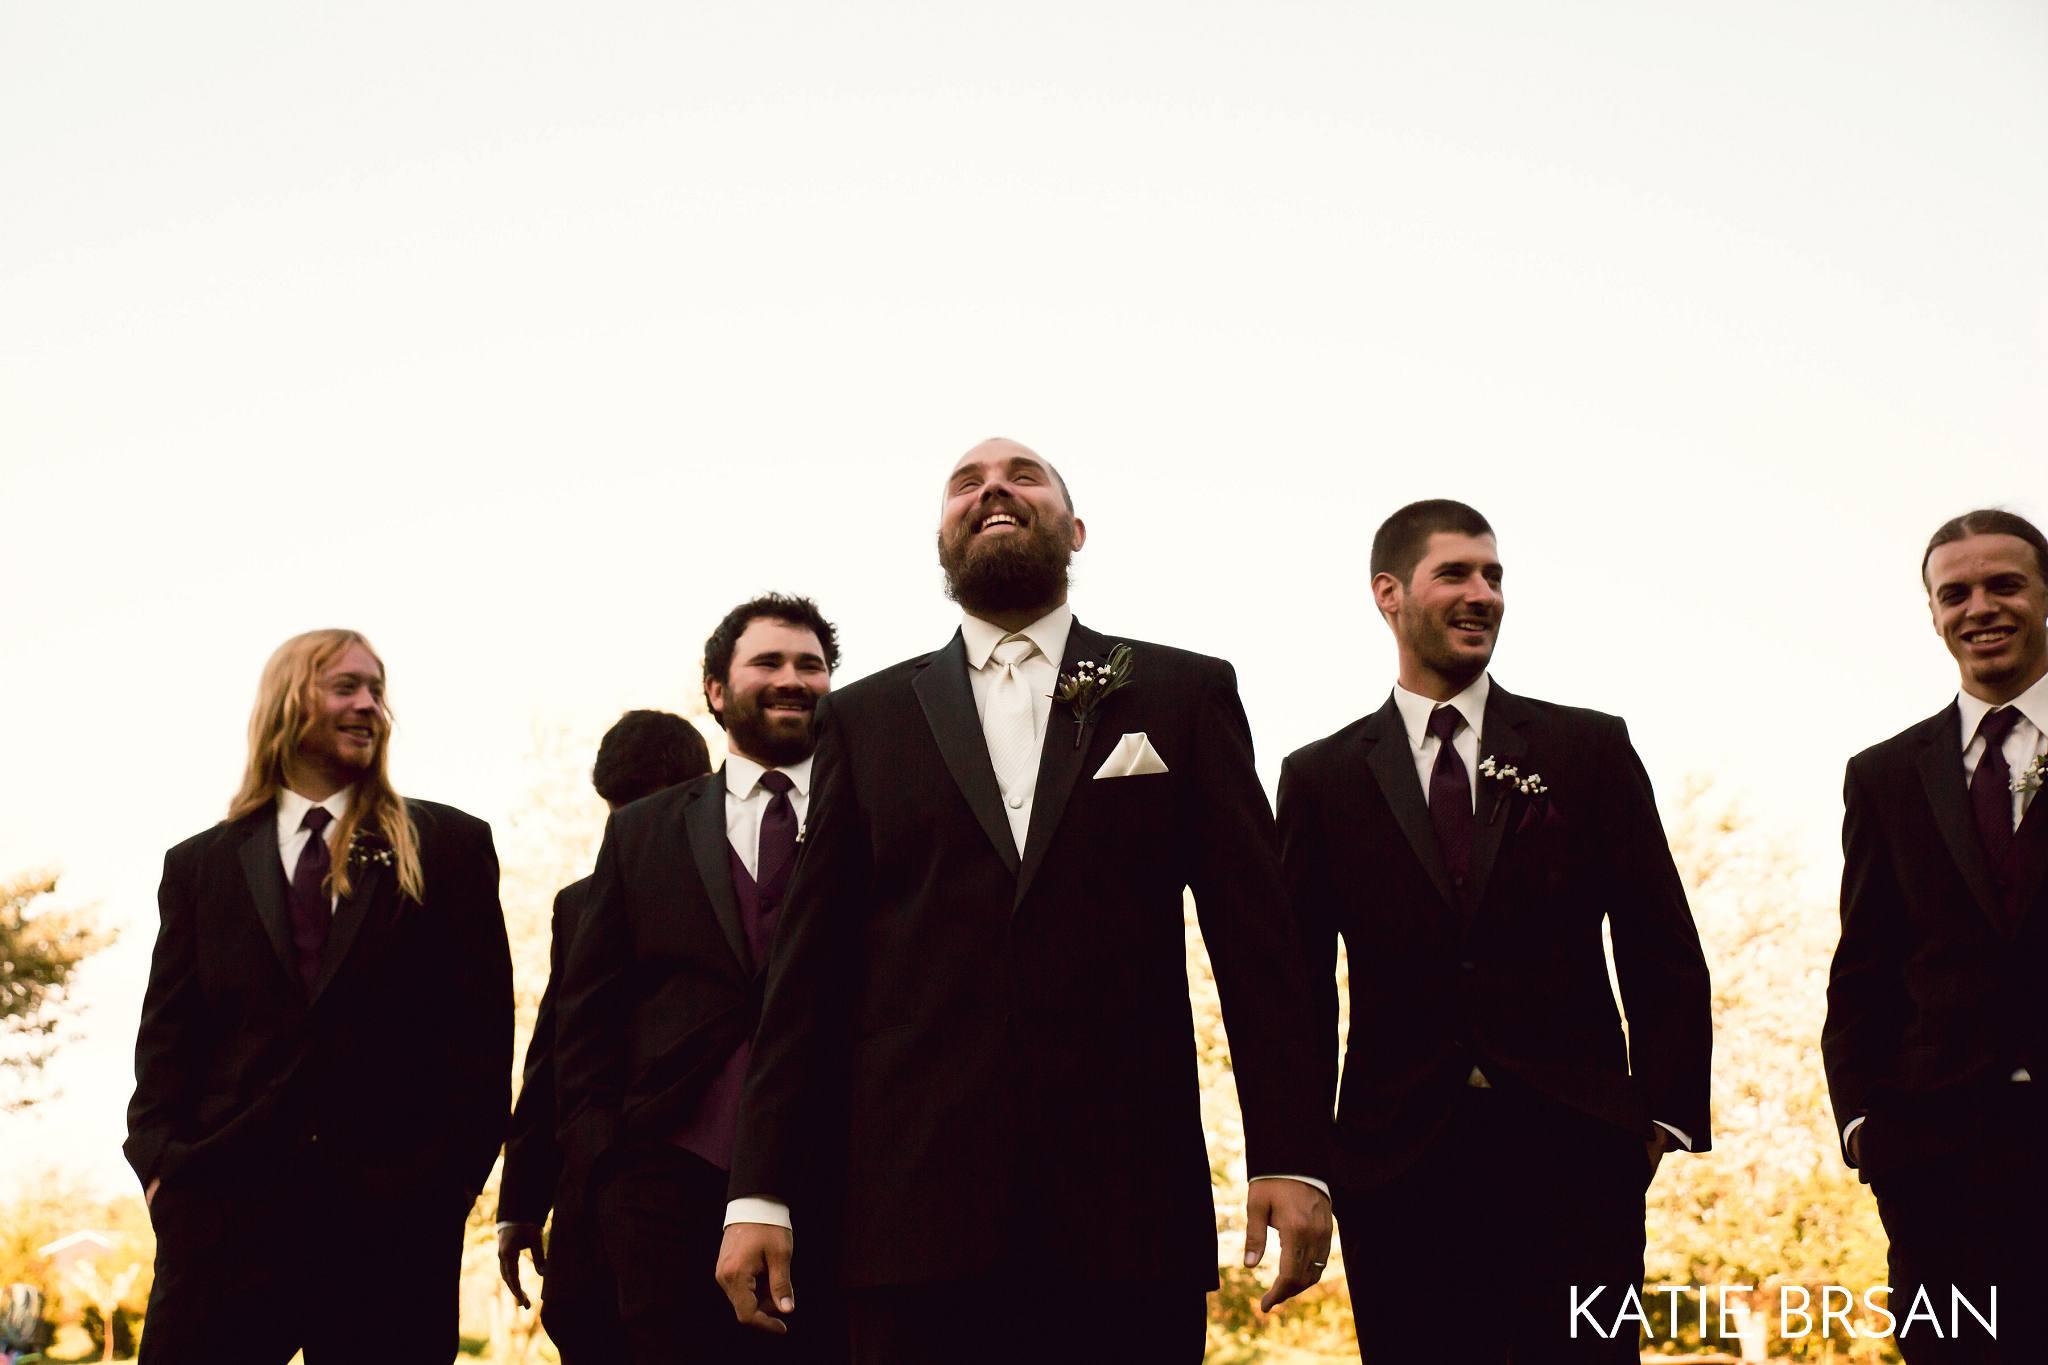 KatieBrsan-Bonfield-Backyard-Wedding_0415.jpg